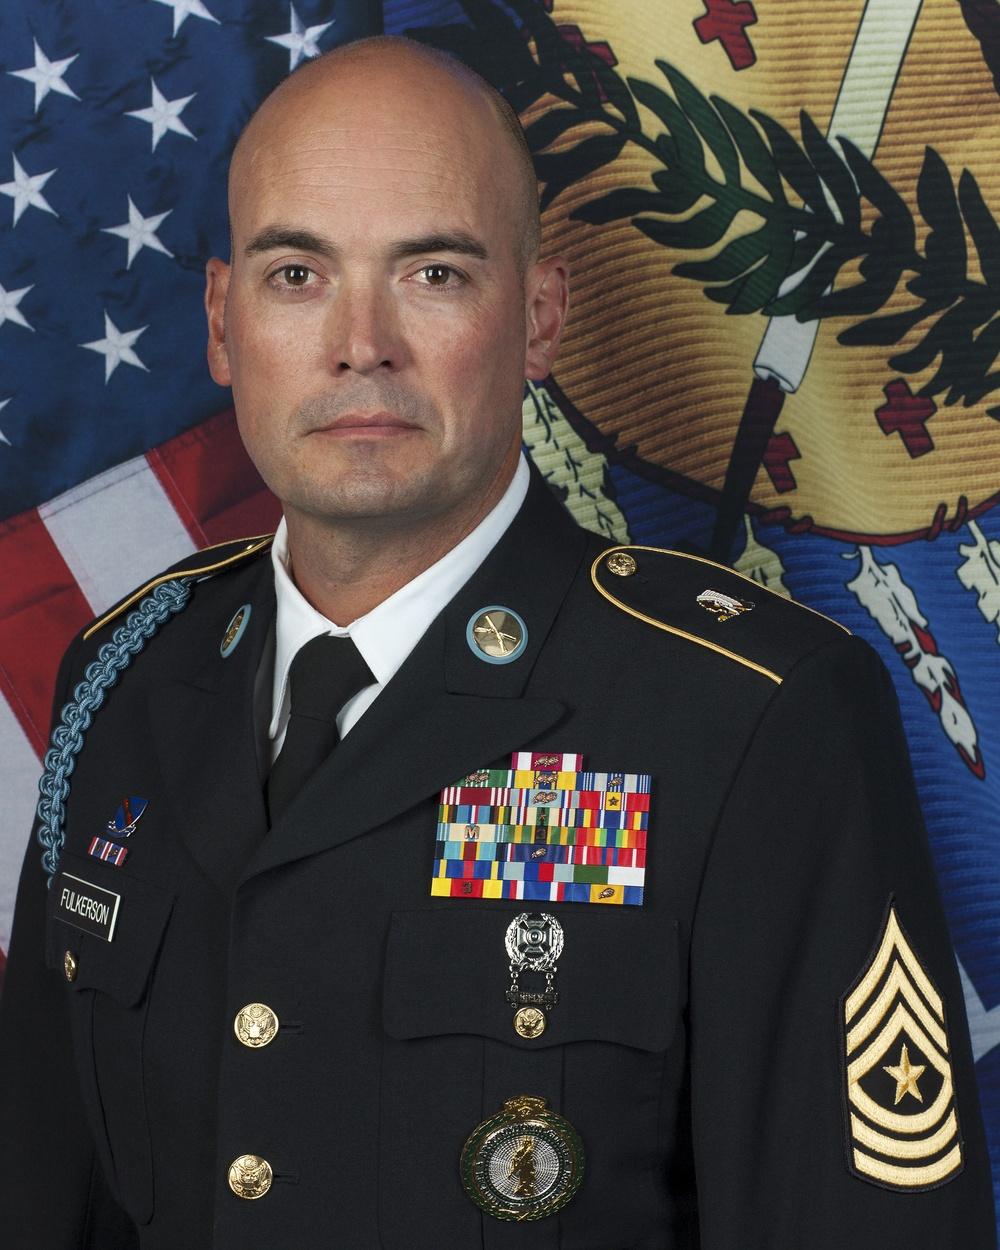 OKARNG sergeant major looks back on Khobar Towers bombing, talks mental health